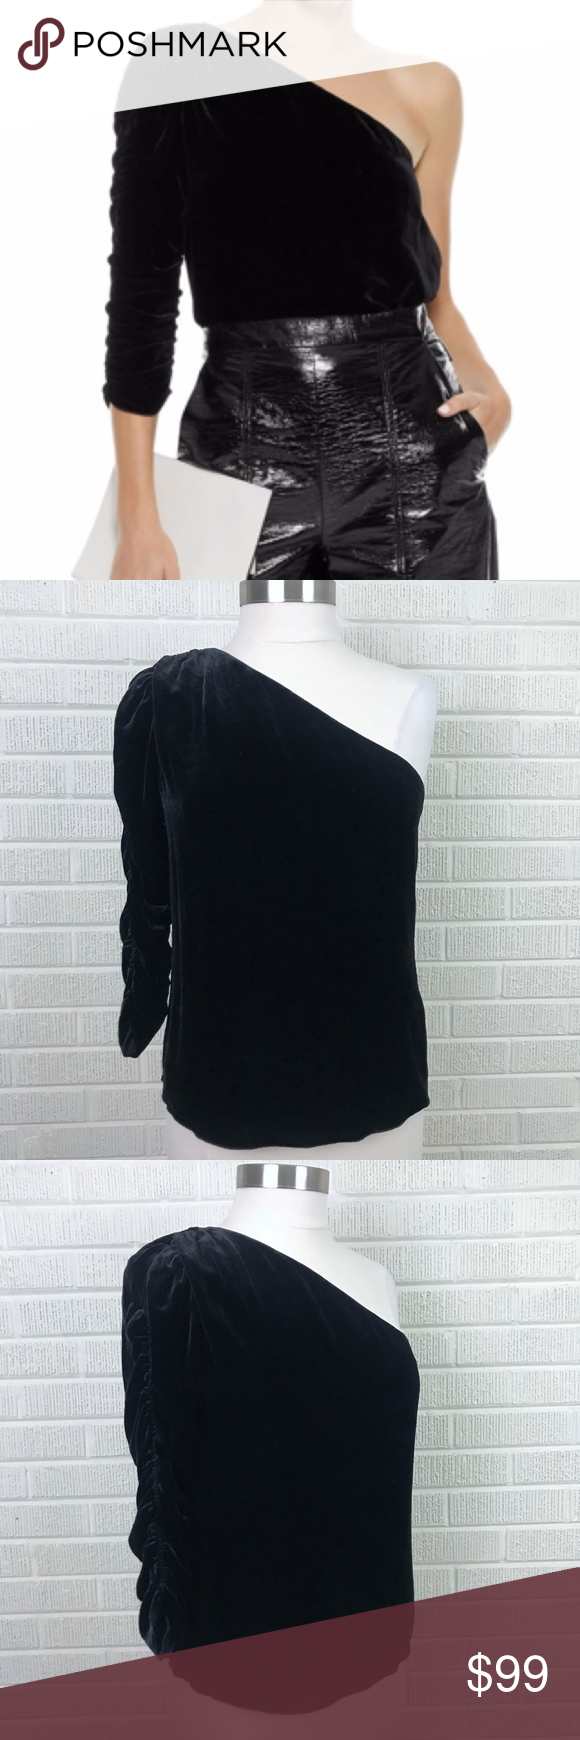 5e5f42f989aca0 Joie Wayman One-Shoulder Velvet Top Black NWT 8 - Joie Wayman One-Shoulder